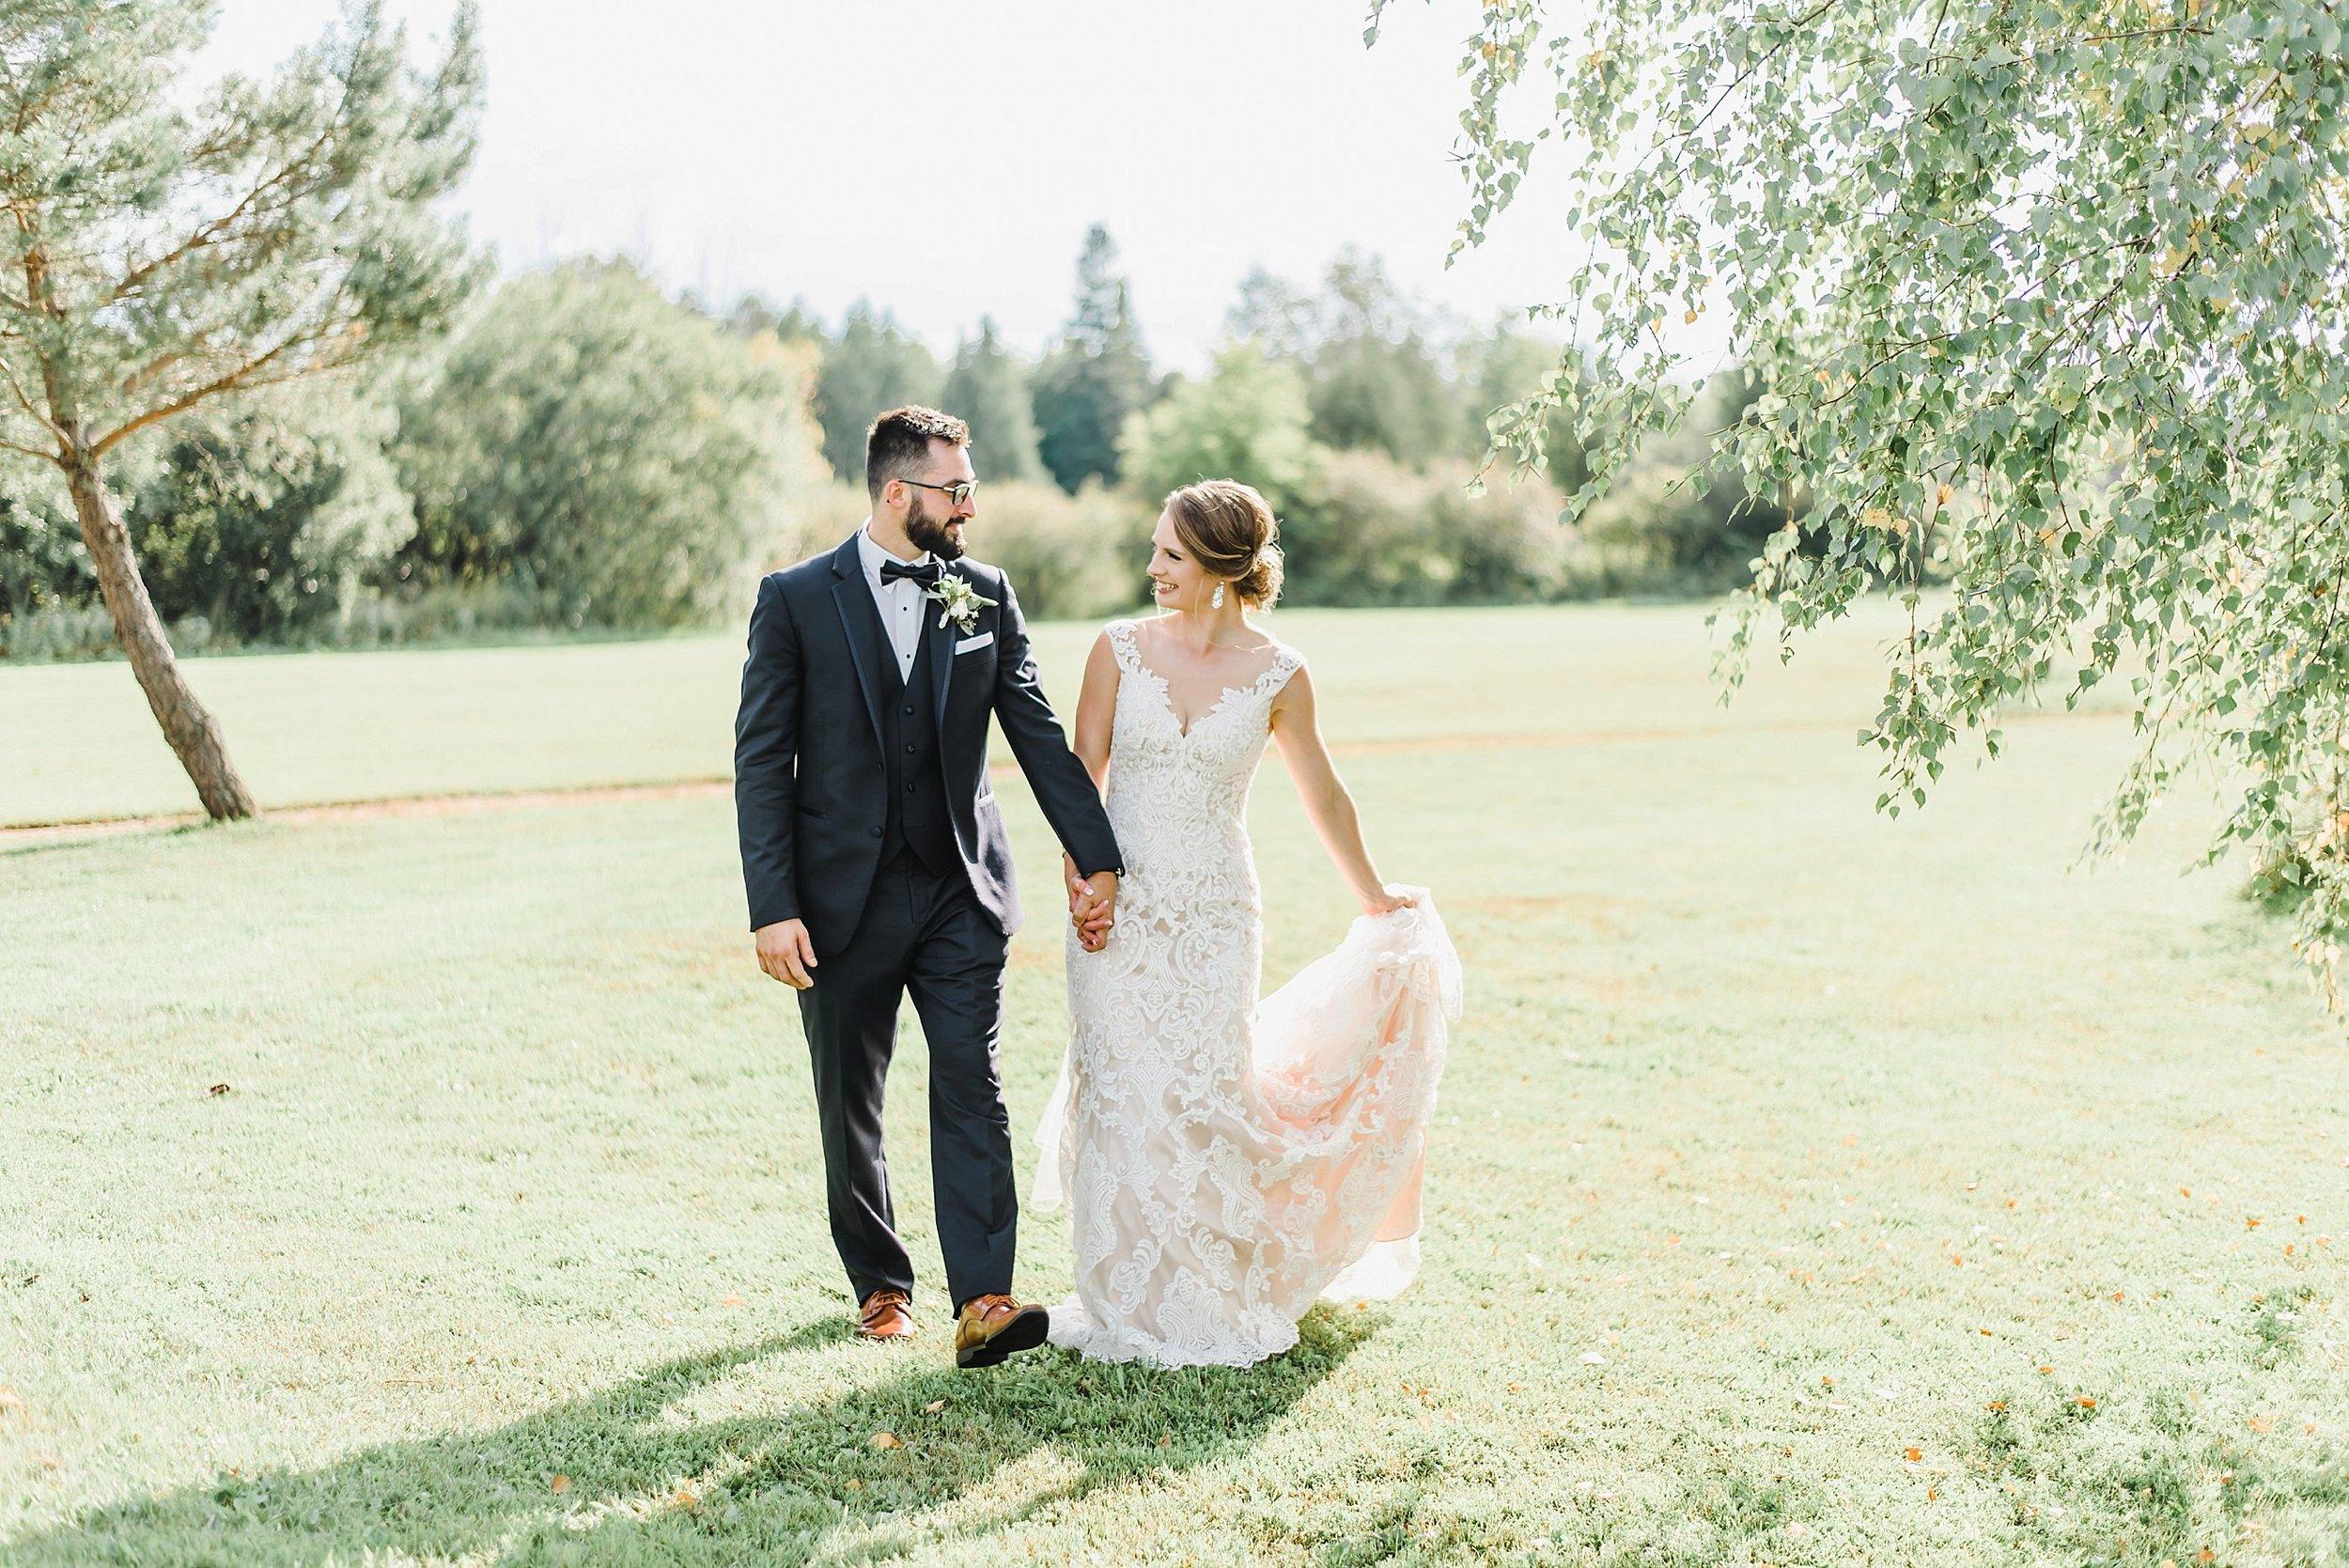 light airy indie fine art ottawa wedding photographer | Ali and Batoul Photography_1306.jpg